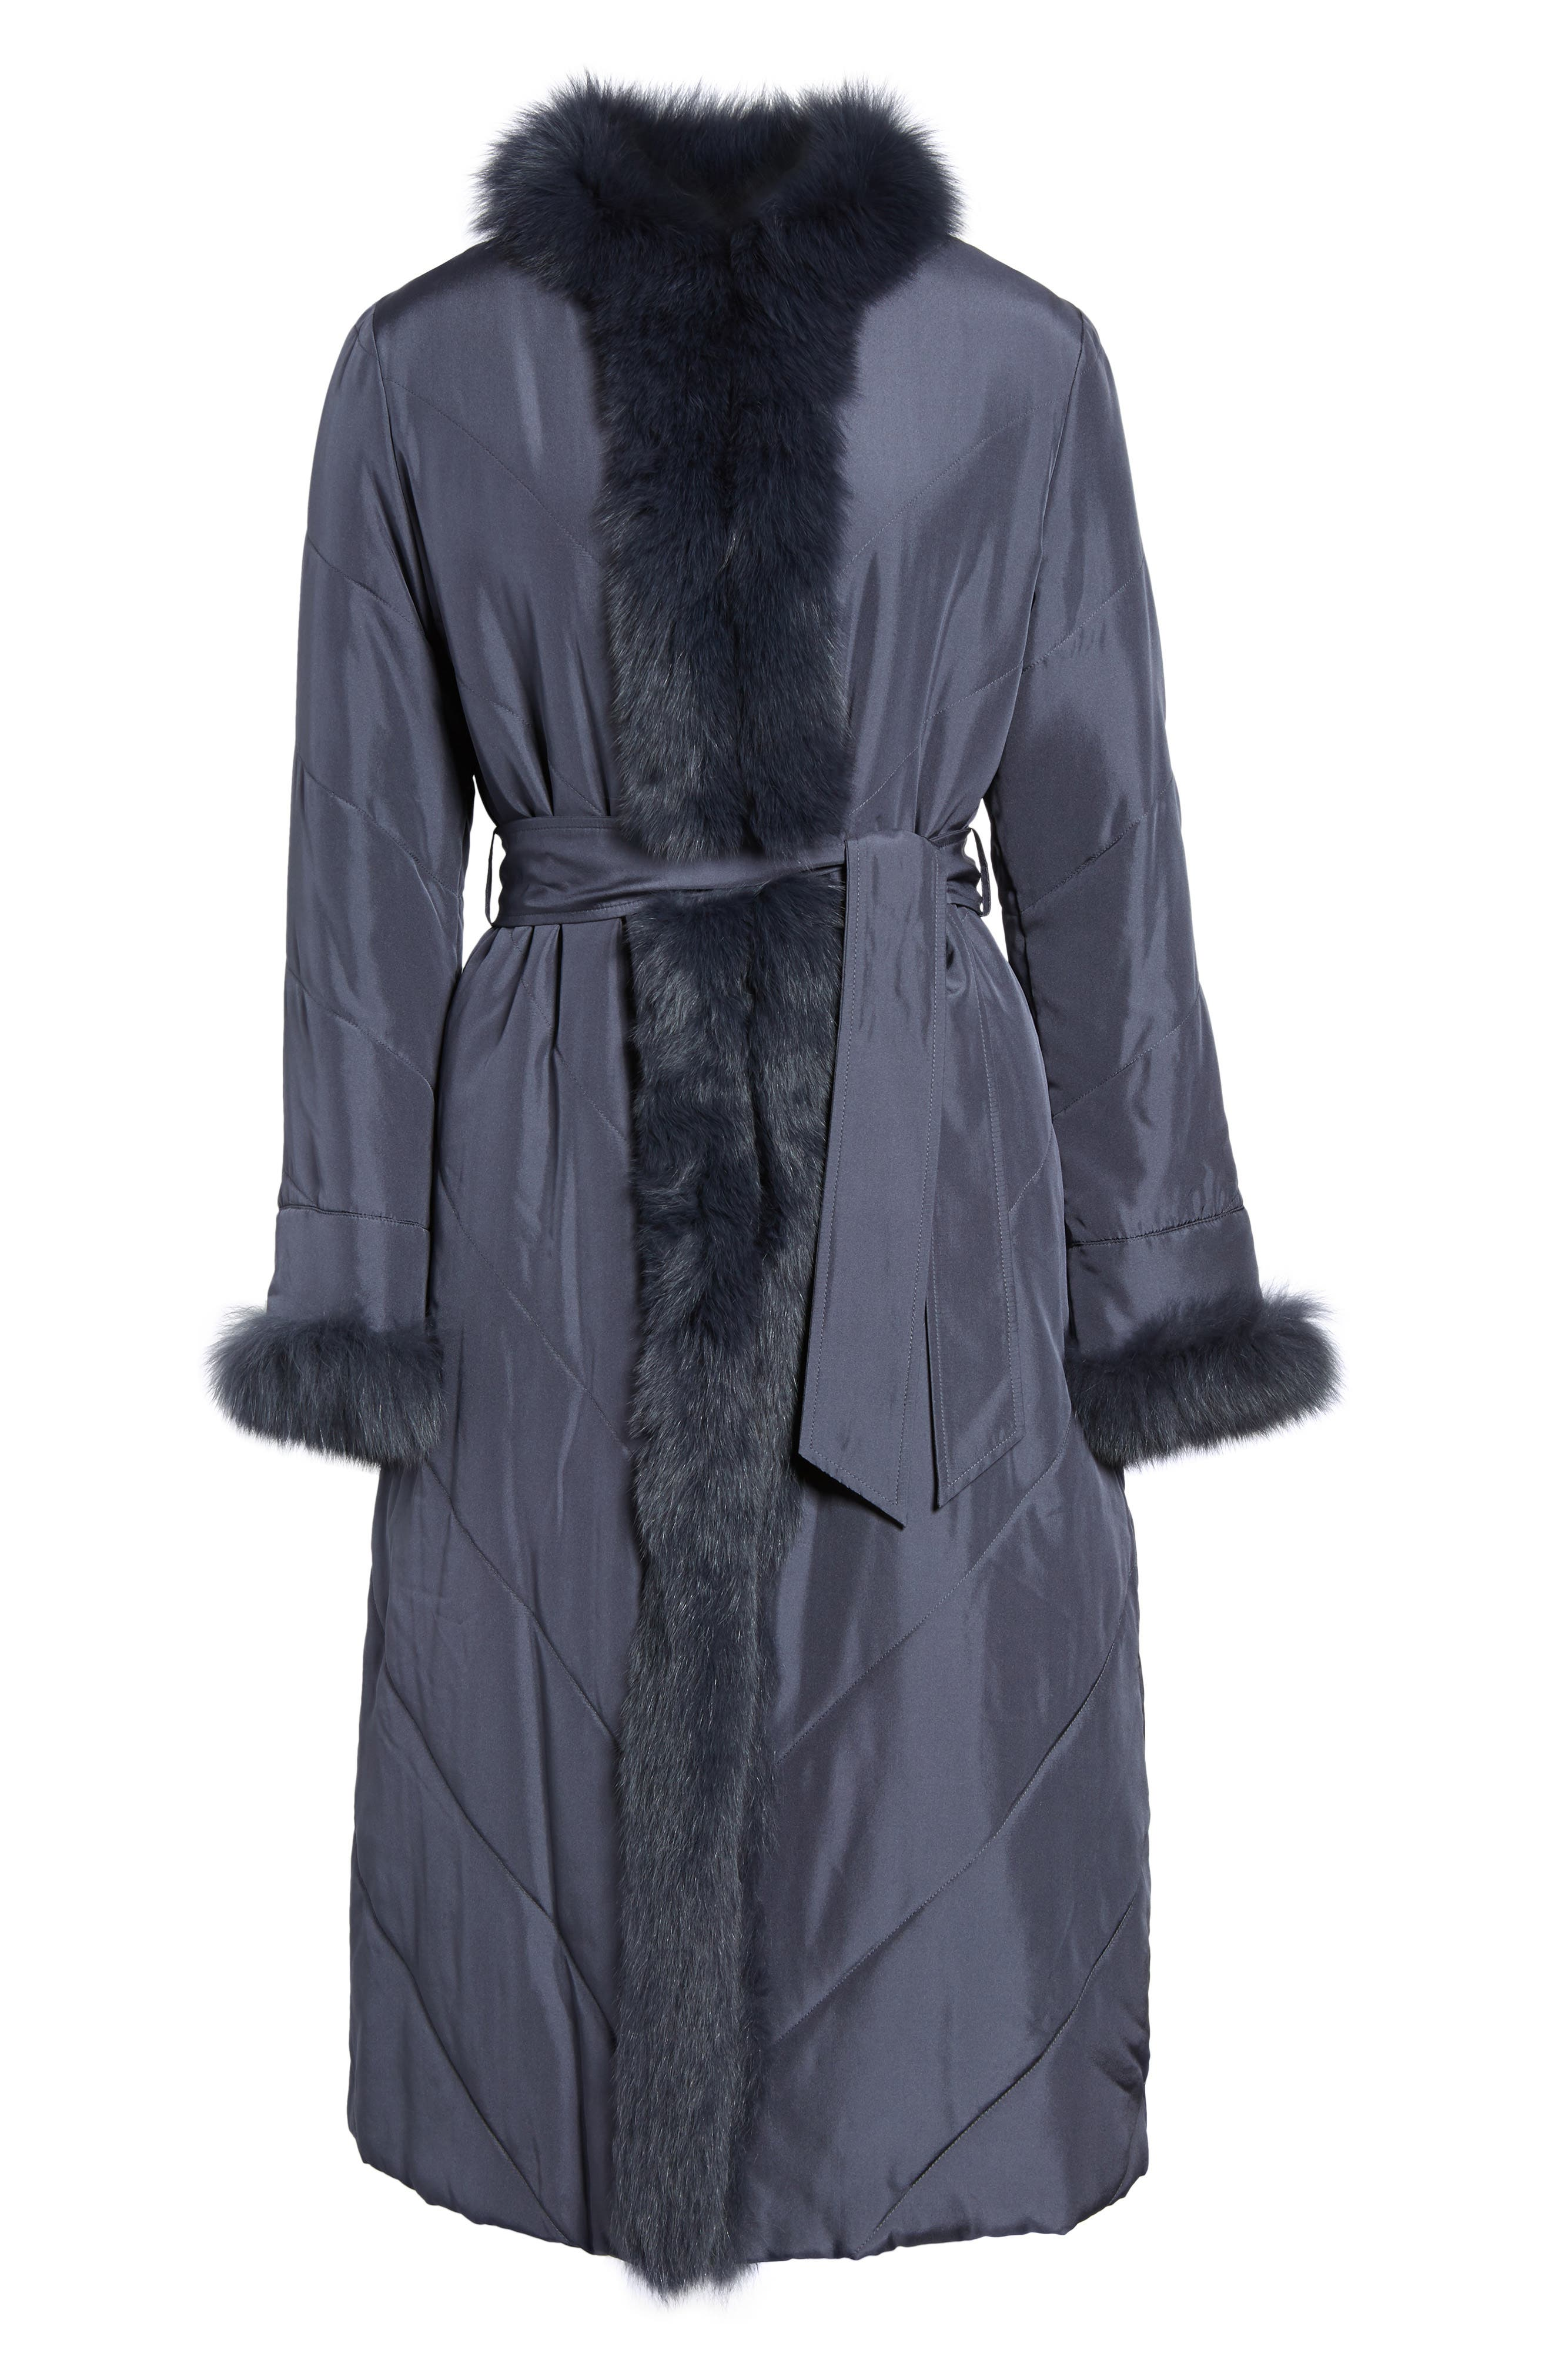 Couture Packable Silk Coat with Genuine Fox Fur & Genuine Rabbit Fur,                             Alternate thumbnail 10, color,